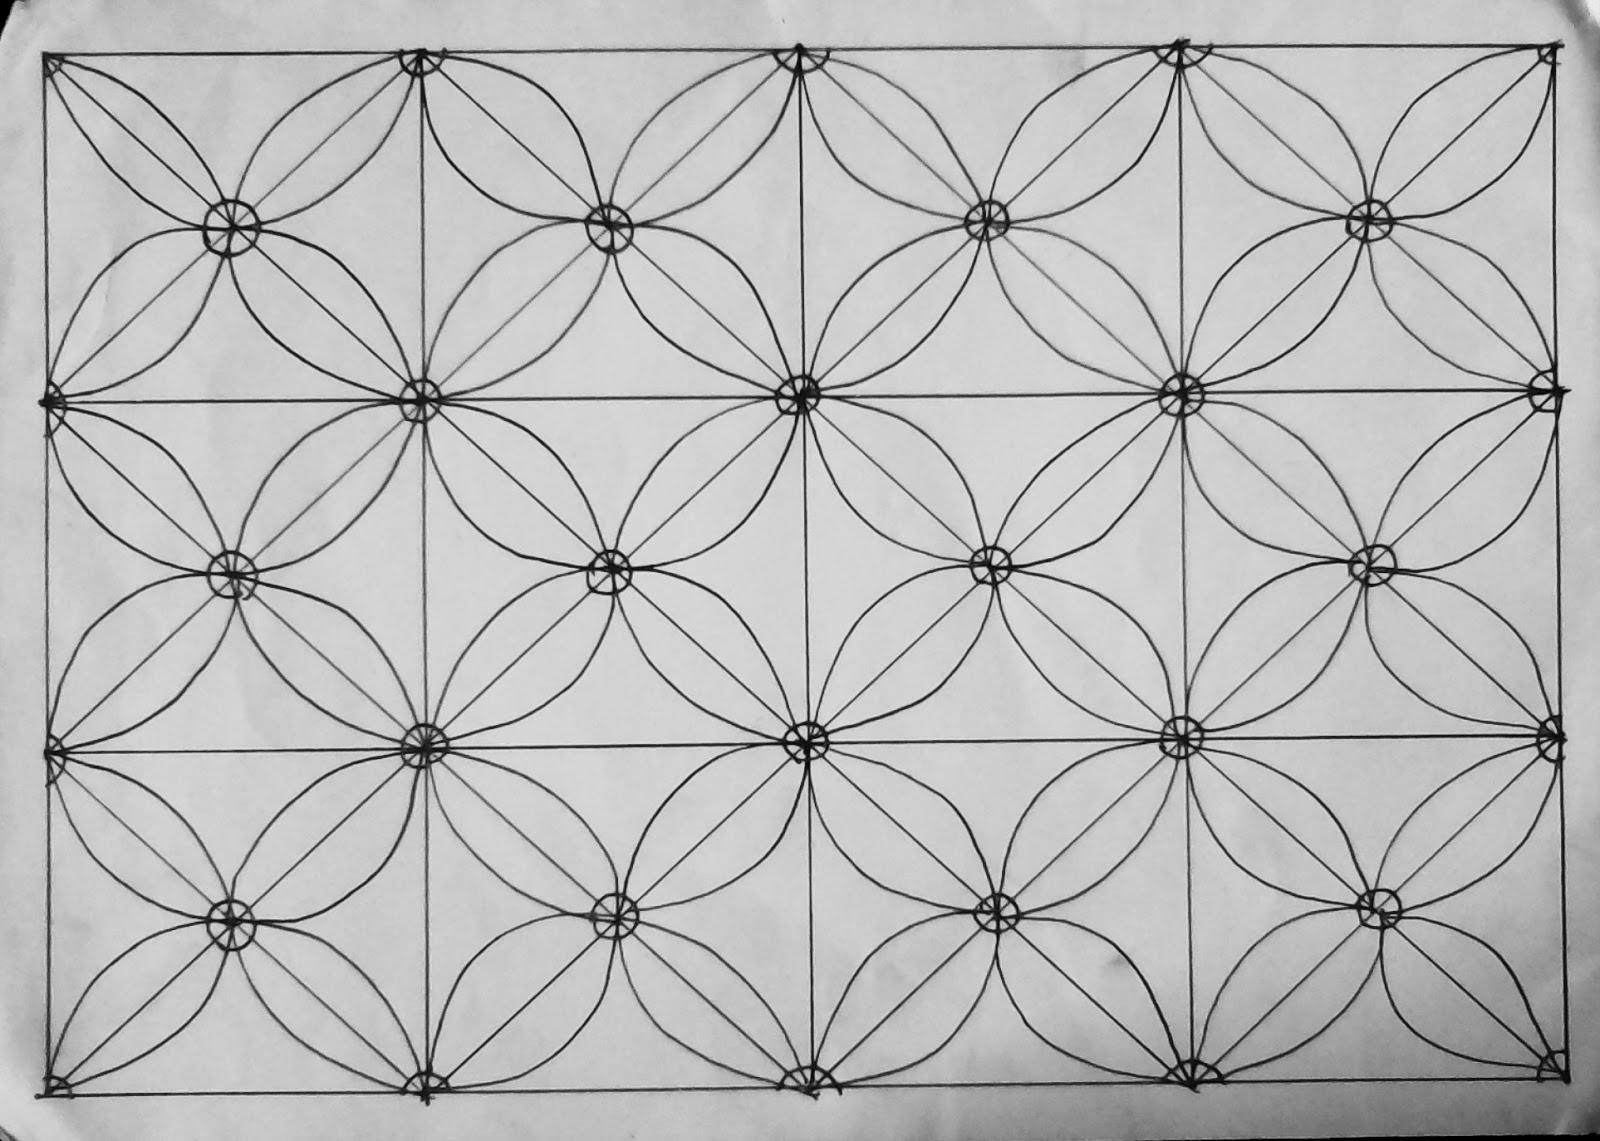 Gambar Sketsa Batik Yang Mudah Digambar